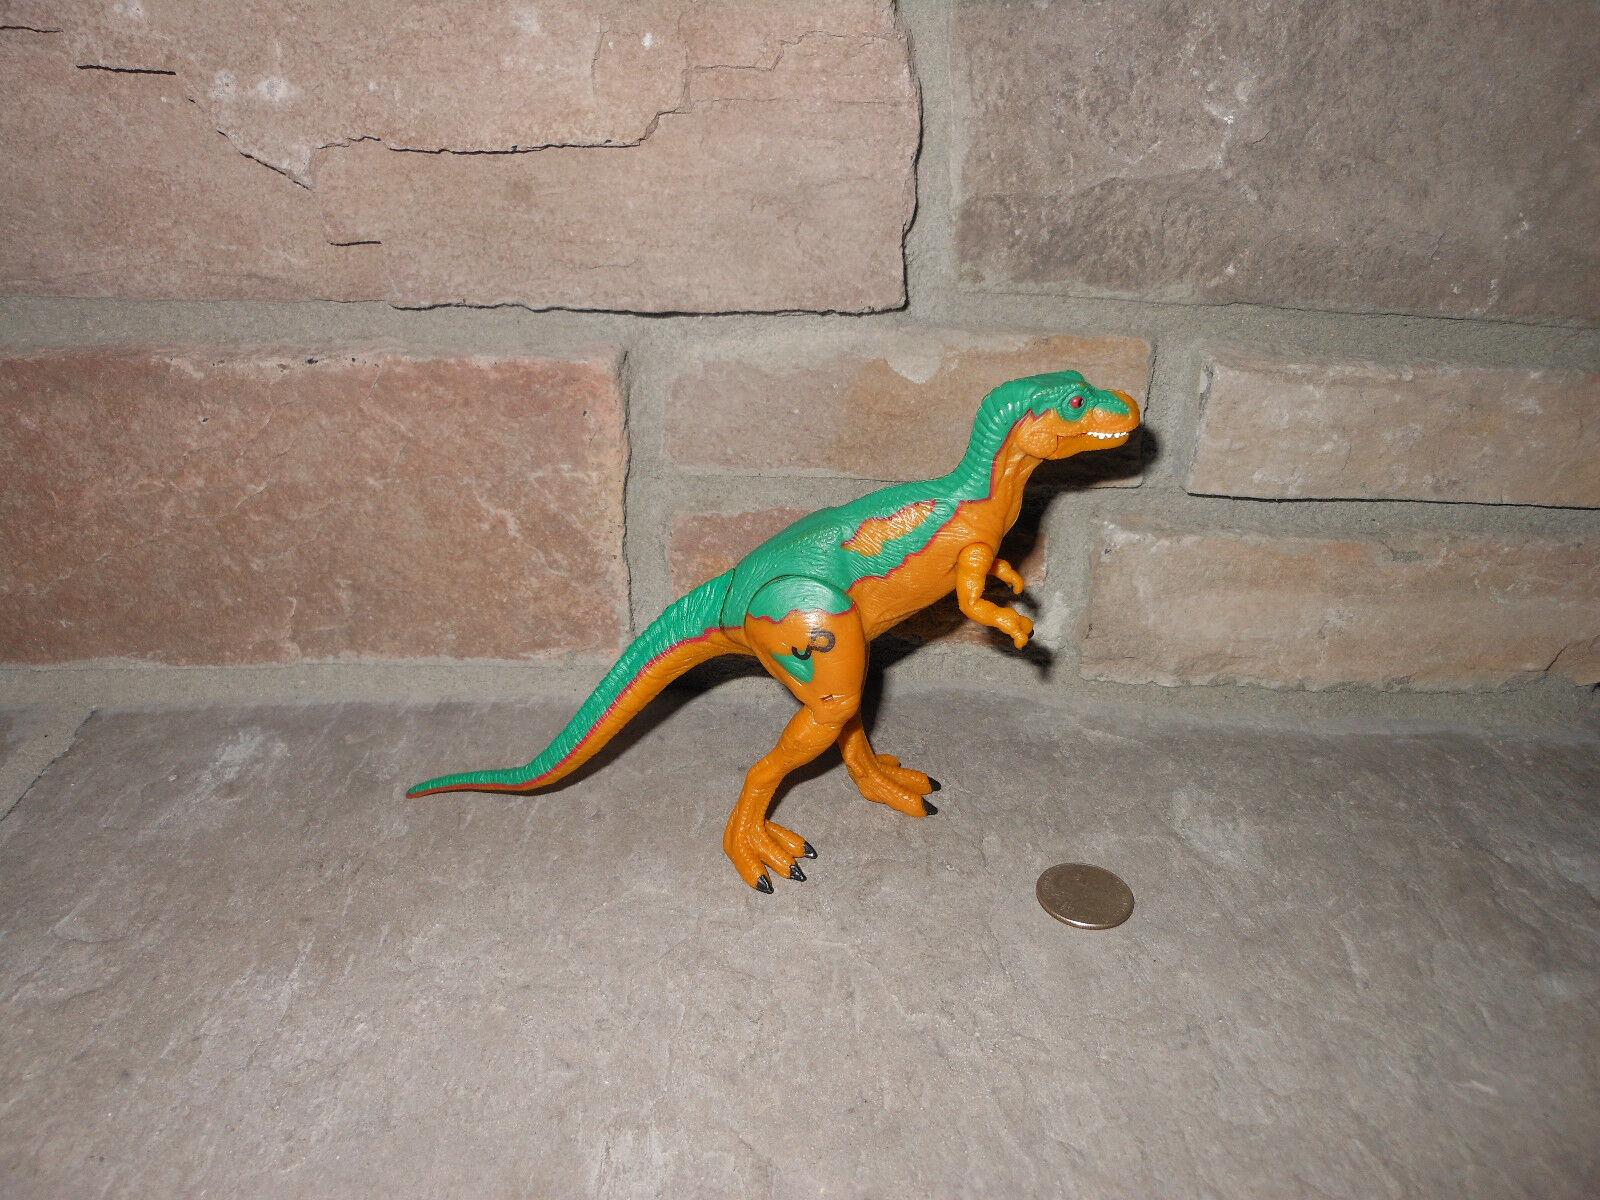 Jurassic Park Dinosaurs Walmart Exclusive 1999 Tyrannosaurus rex T.rex Junior 2